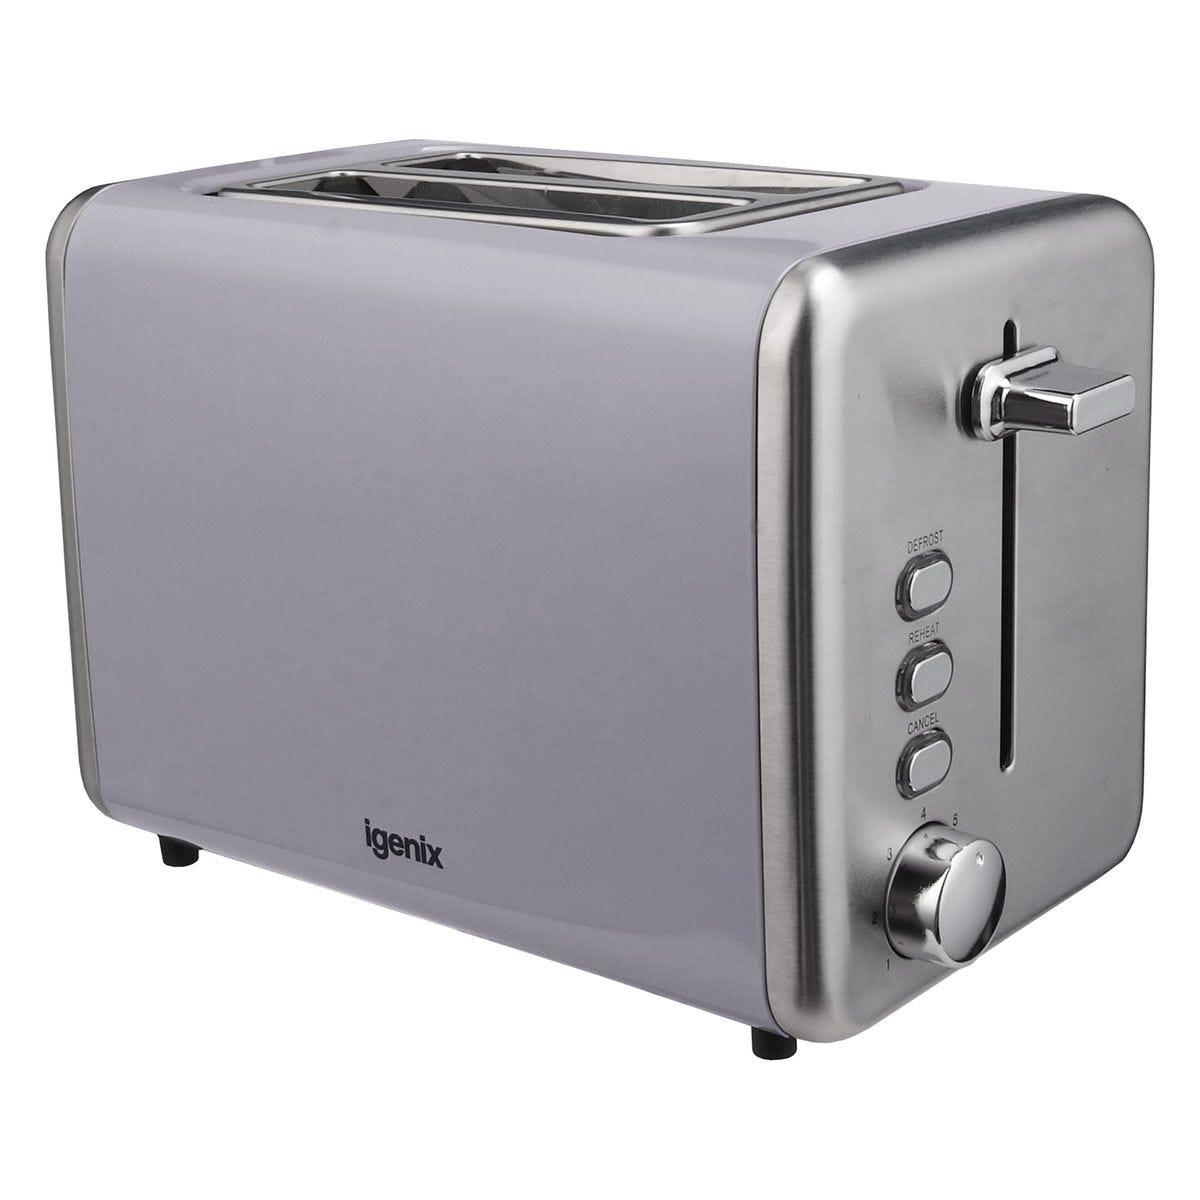 Igenix IG3000G 2-Slice Stainless Steel Toaster - Grey